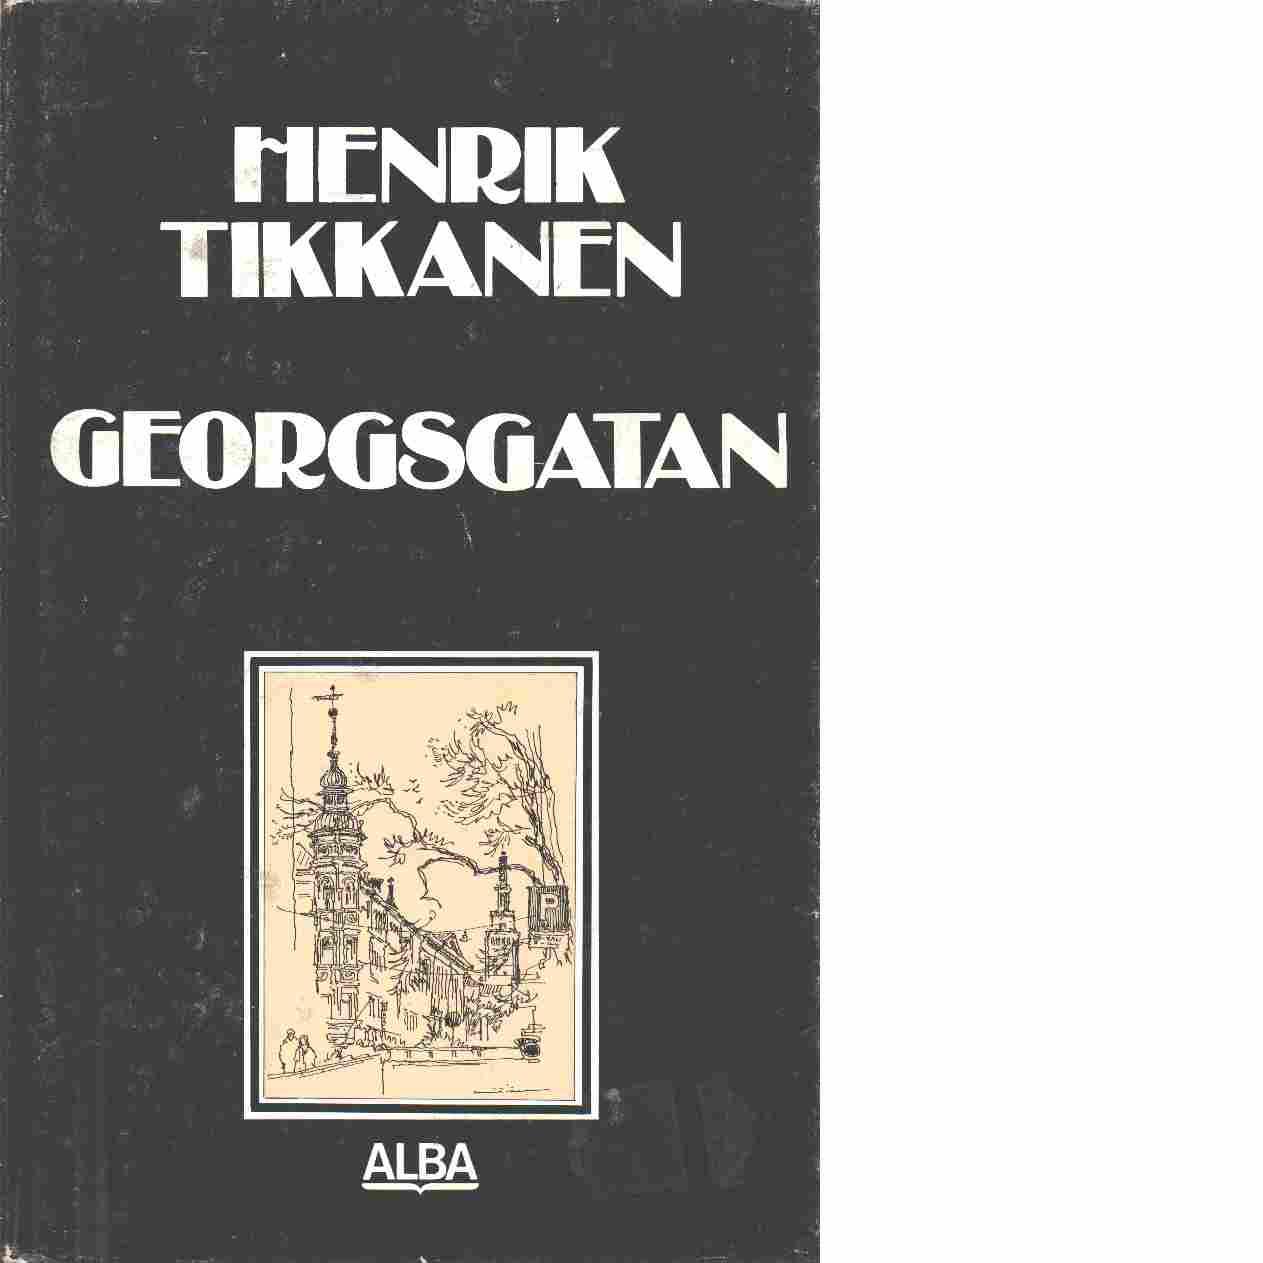 Georgsgatan - Tikkanen, Henrik